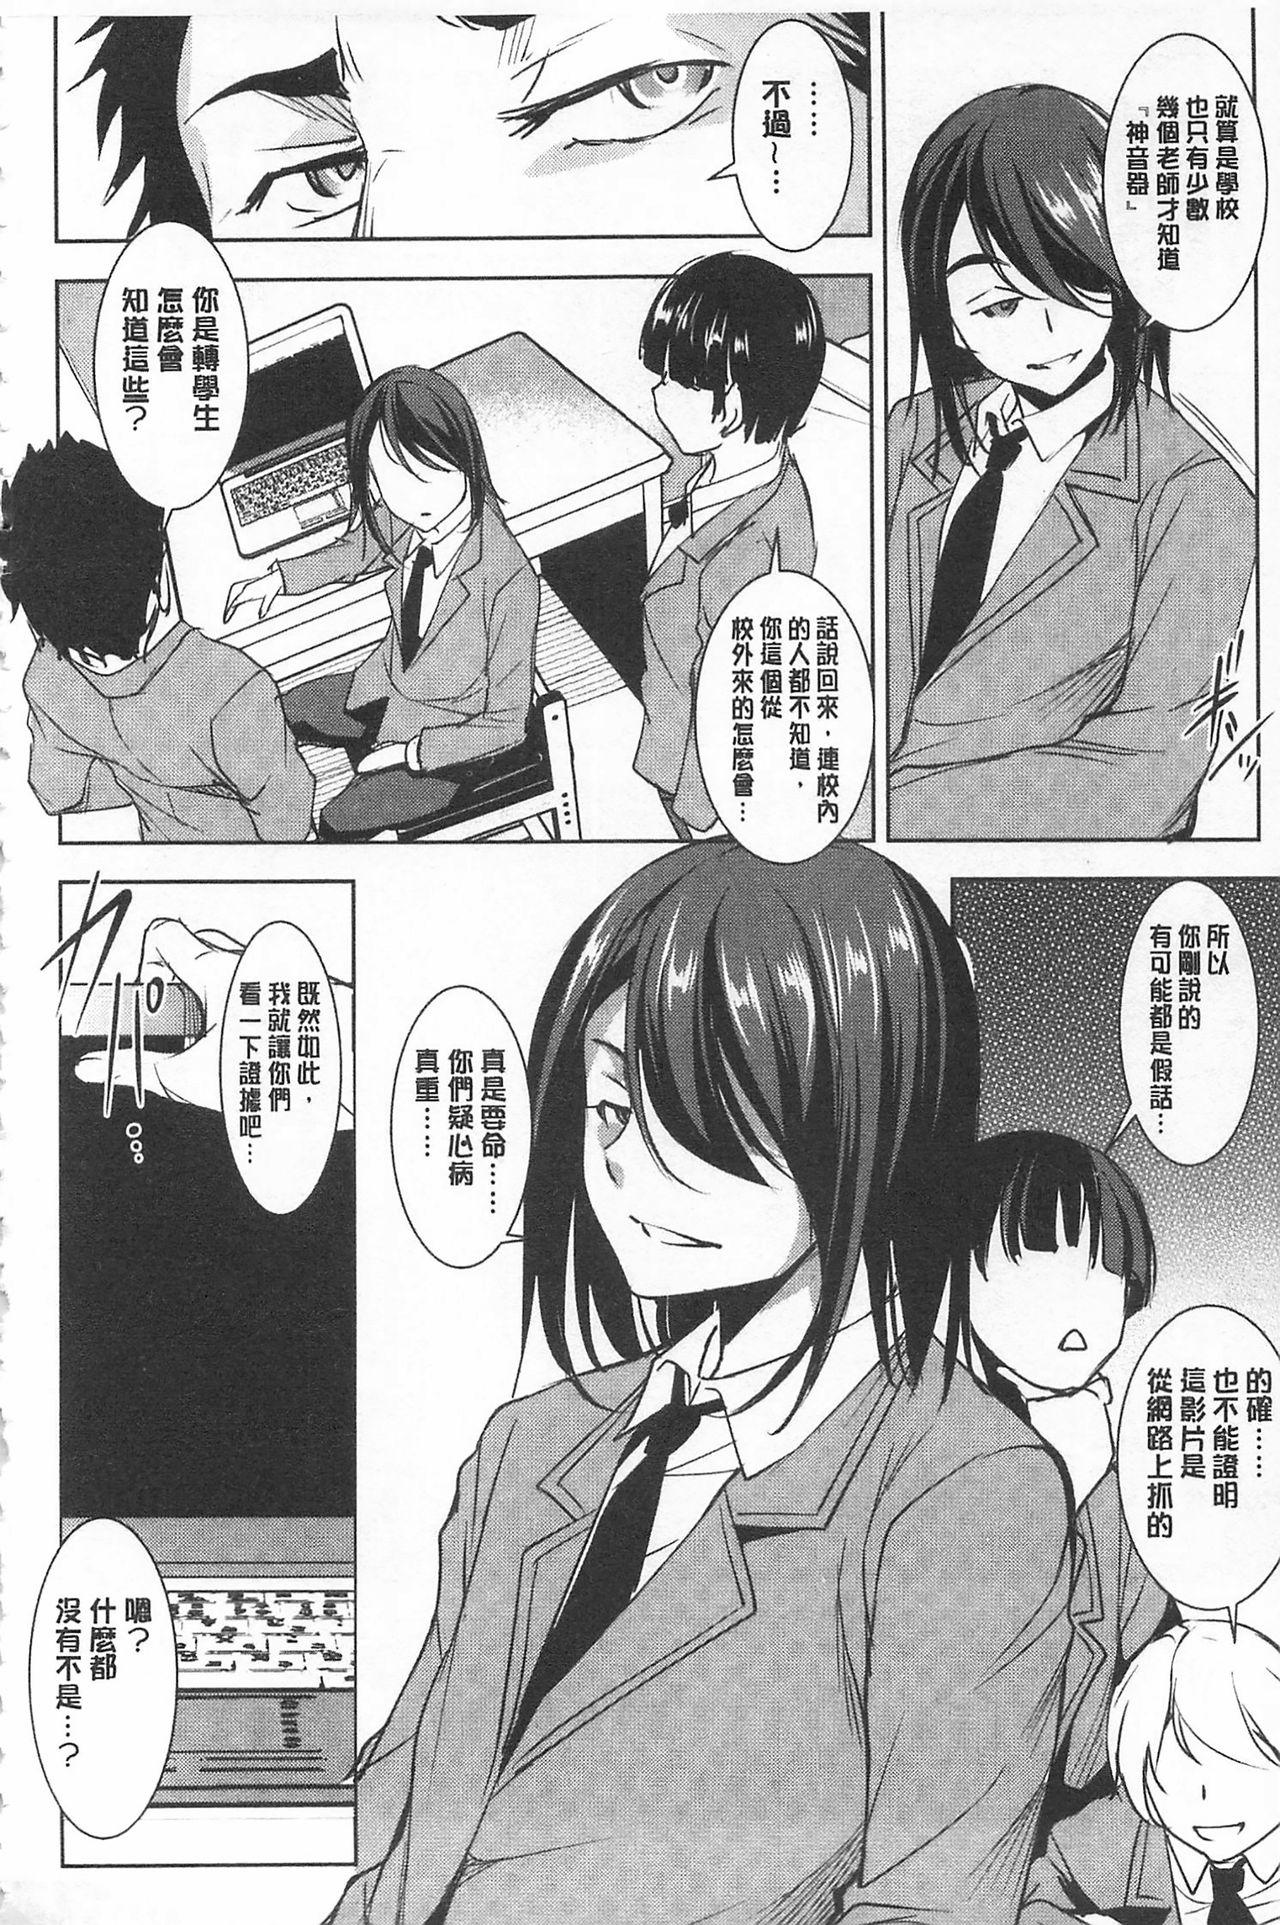 [Amano Kazumi] Seida Inyou -Seijo no Katachi Shita Intou- | 聖墮陰陽 -聖女的容貌與淫蕩- [Chinese] 115